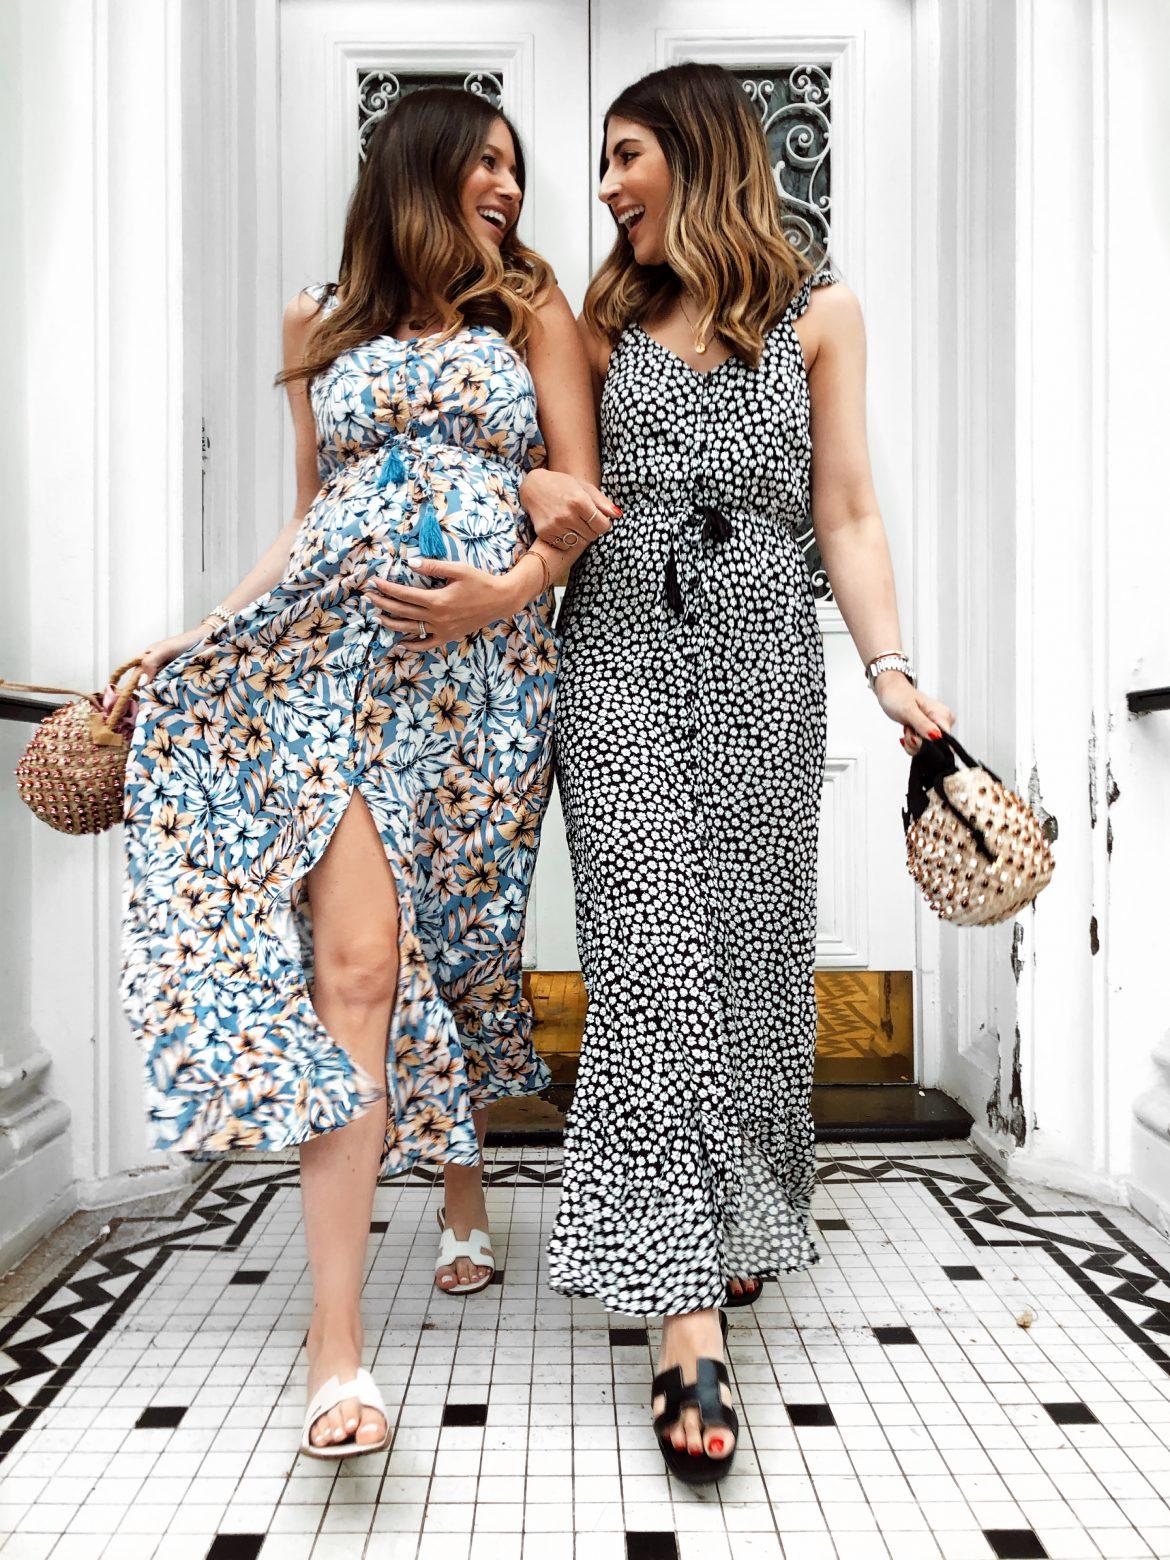 eea52d9d347df Philippa's wearing New Look dress | BeachFlamingo bag | Hermes sandals  (high street version here) Sarah's wearing: New Look dress | BeachFlamingo  bag ...